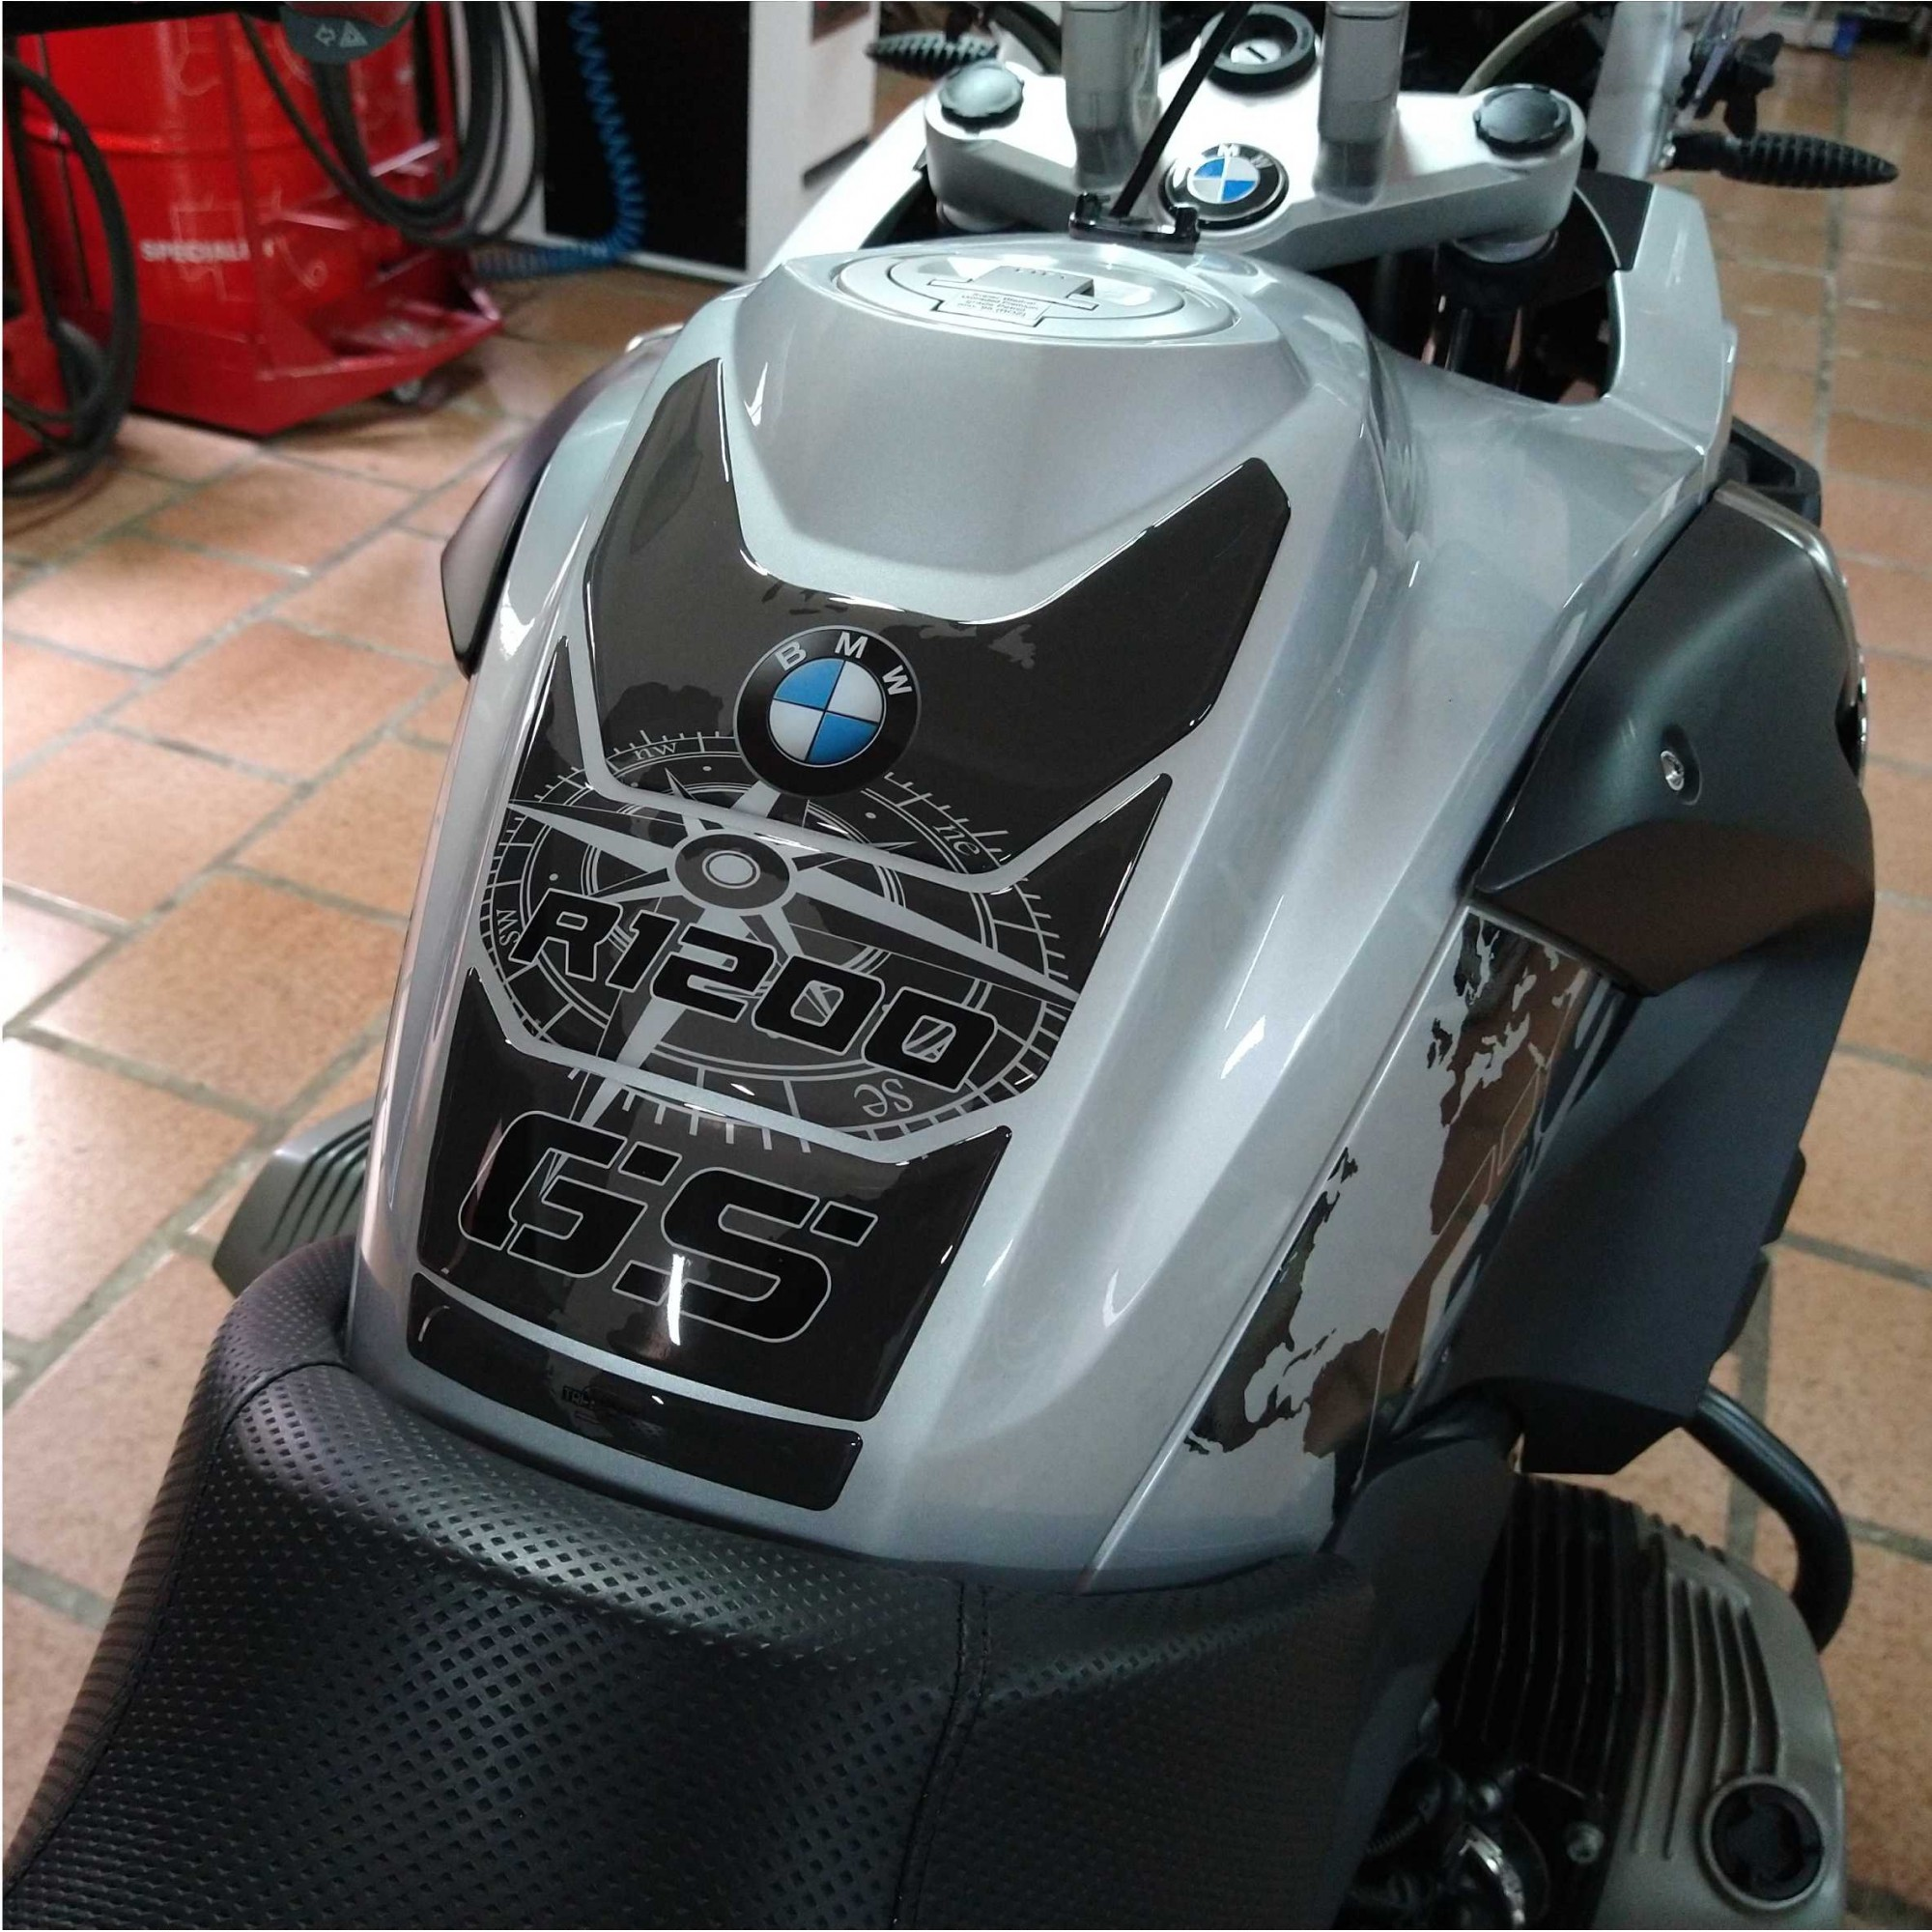 KIT Adesivos Protetor Tanque BMW R1200 Gs Premium Até 2013 - MAPA